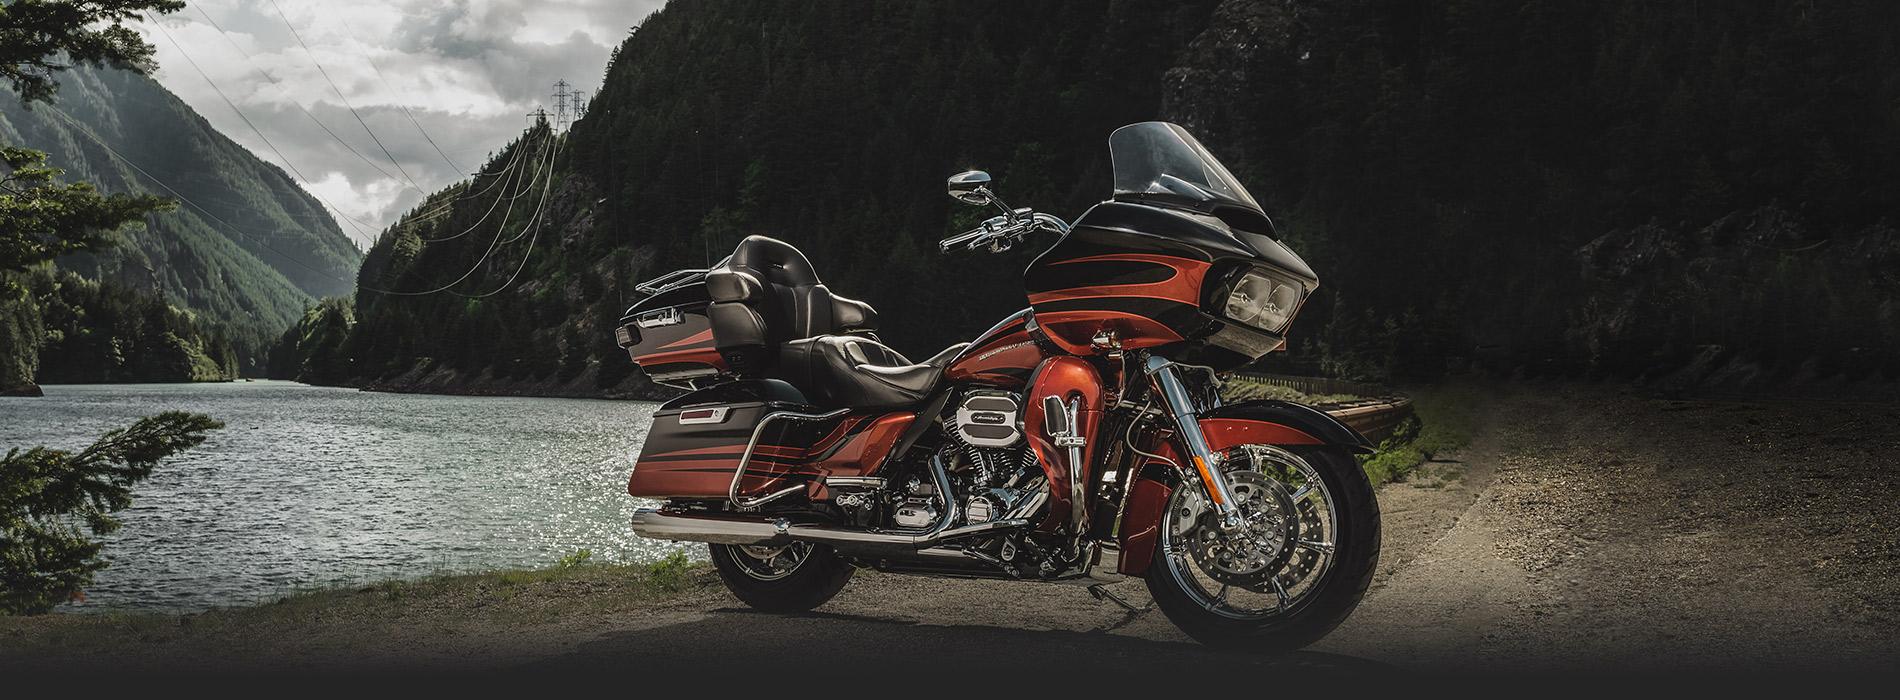 Harley Davidson Recalls More Than 185000 Bikes For Saddlebags That 2015 Flhtcu 4 Pin Wiring Harness 15 Photos